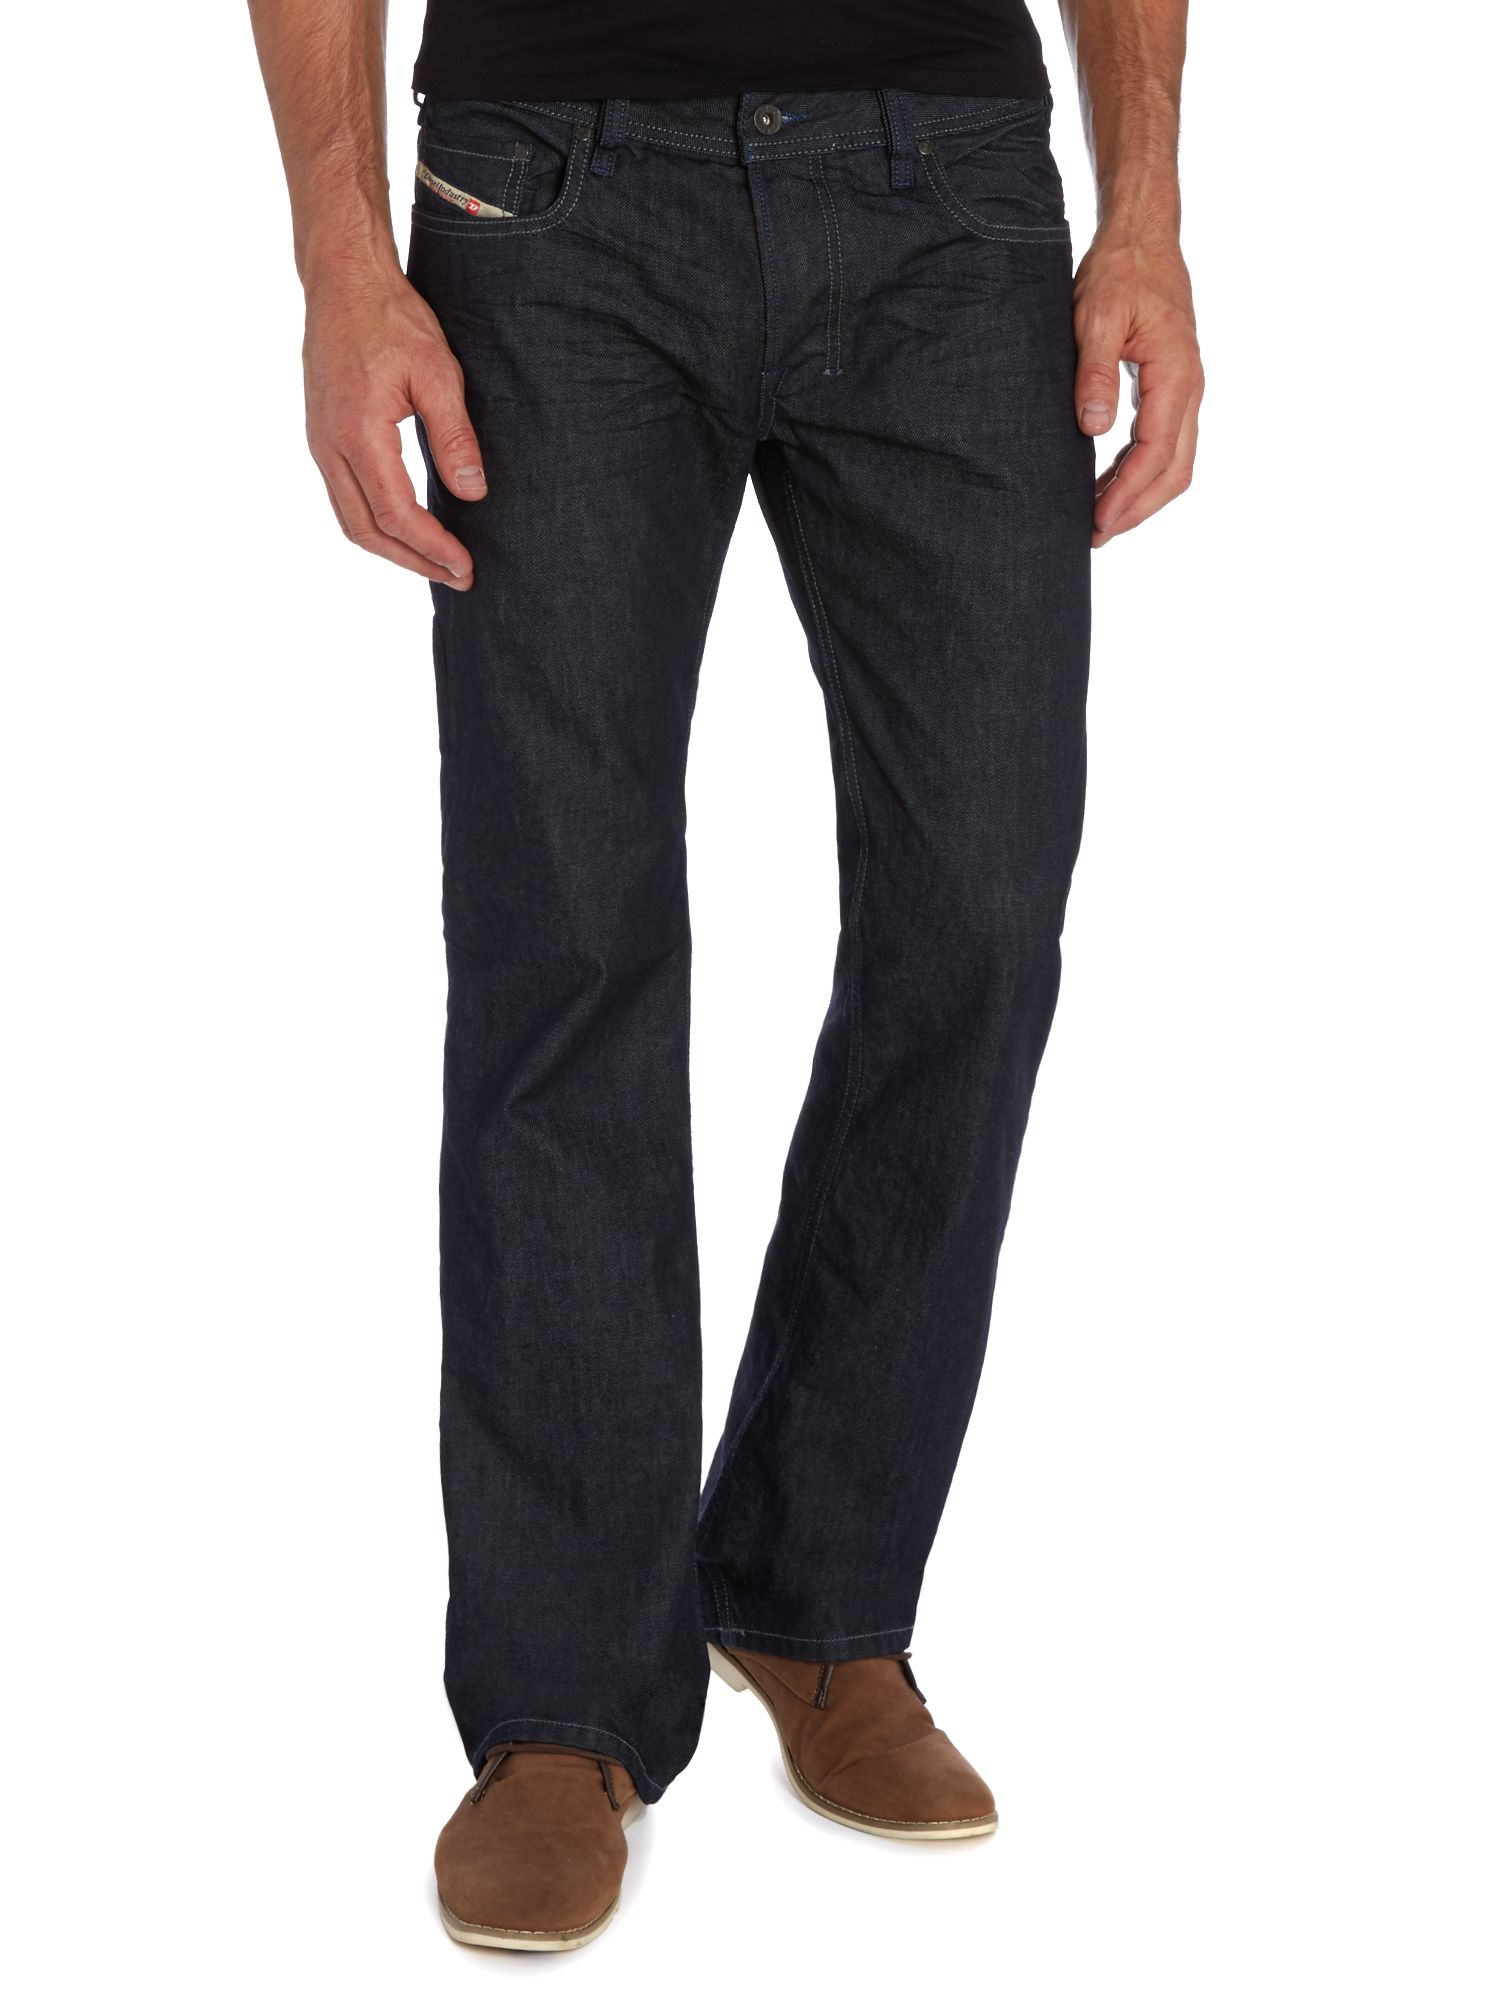 Diesel Zatiny 88z Bootcut Jeans in Black for Men | Lyst